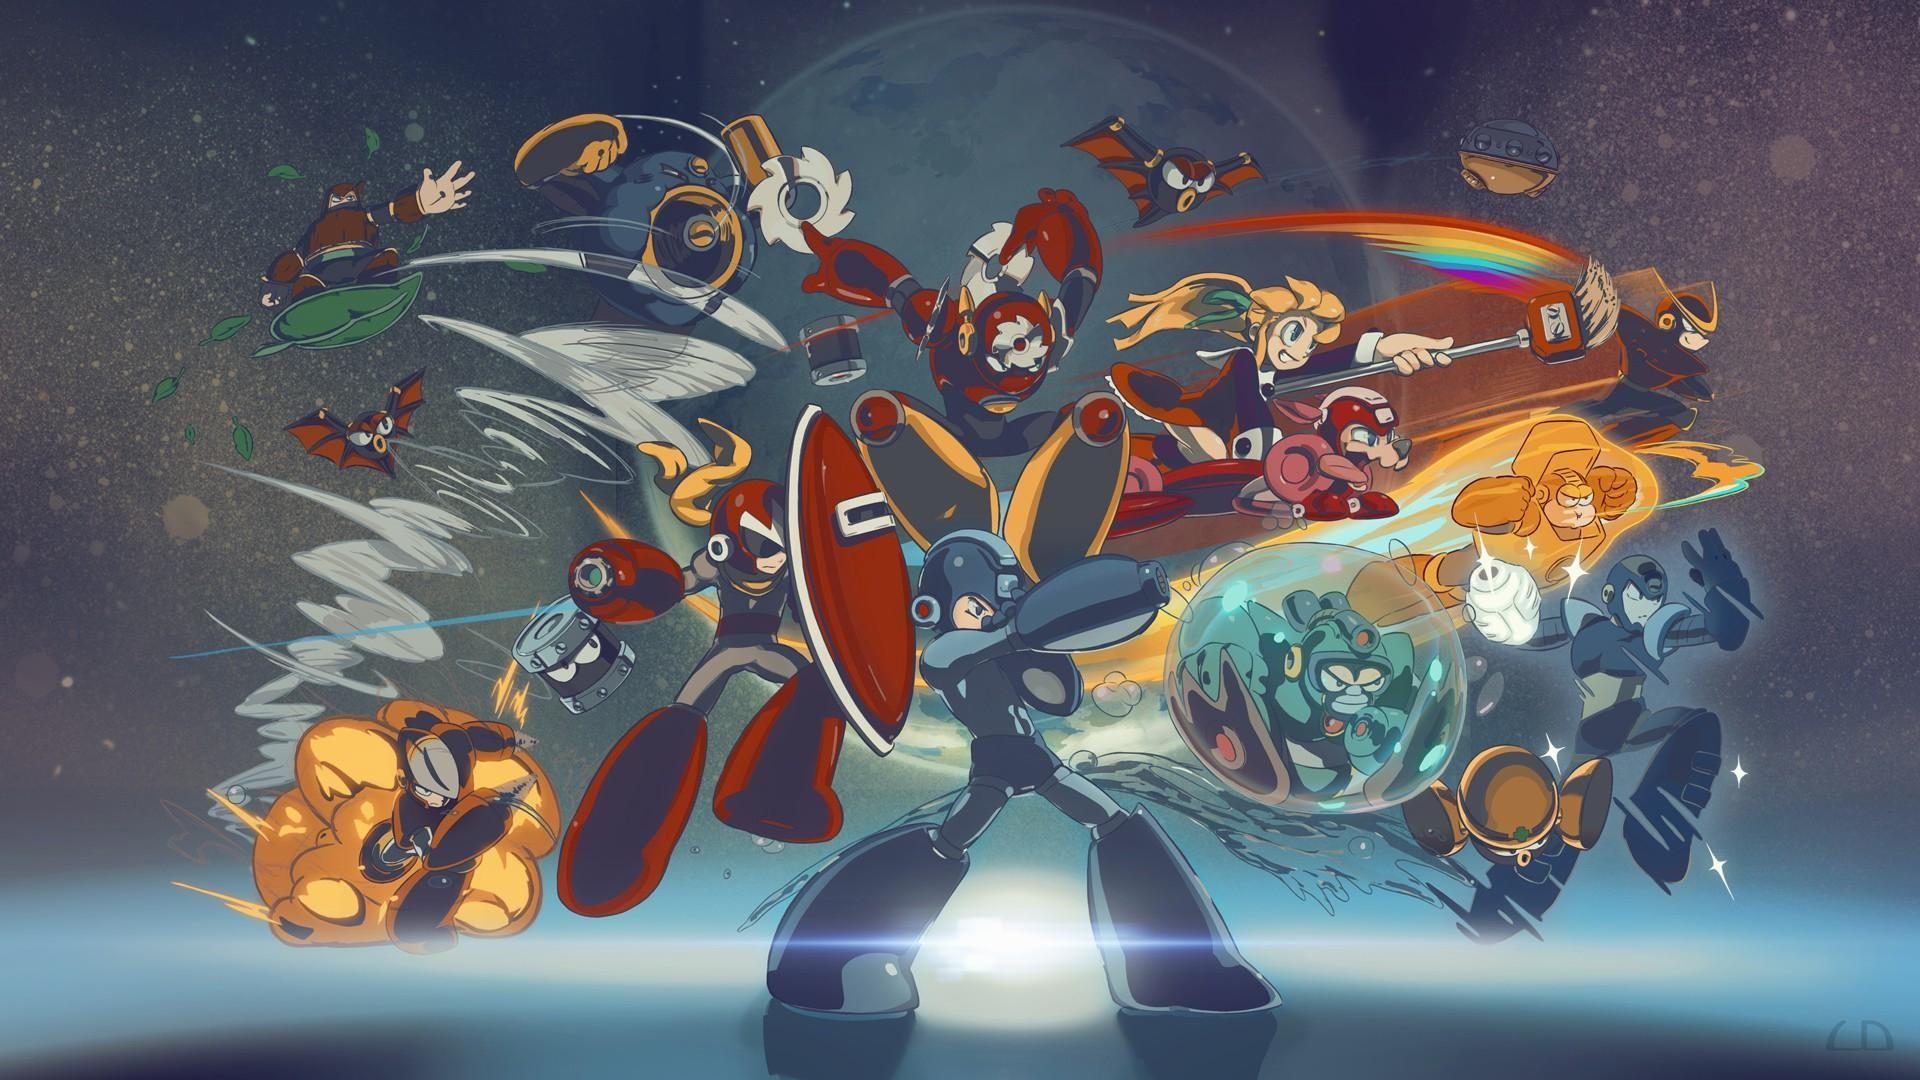 Megaman-Wallpaper-HD-Free-Download